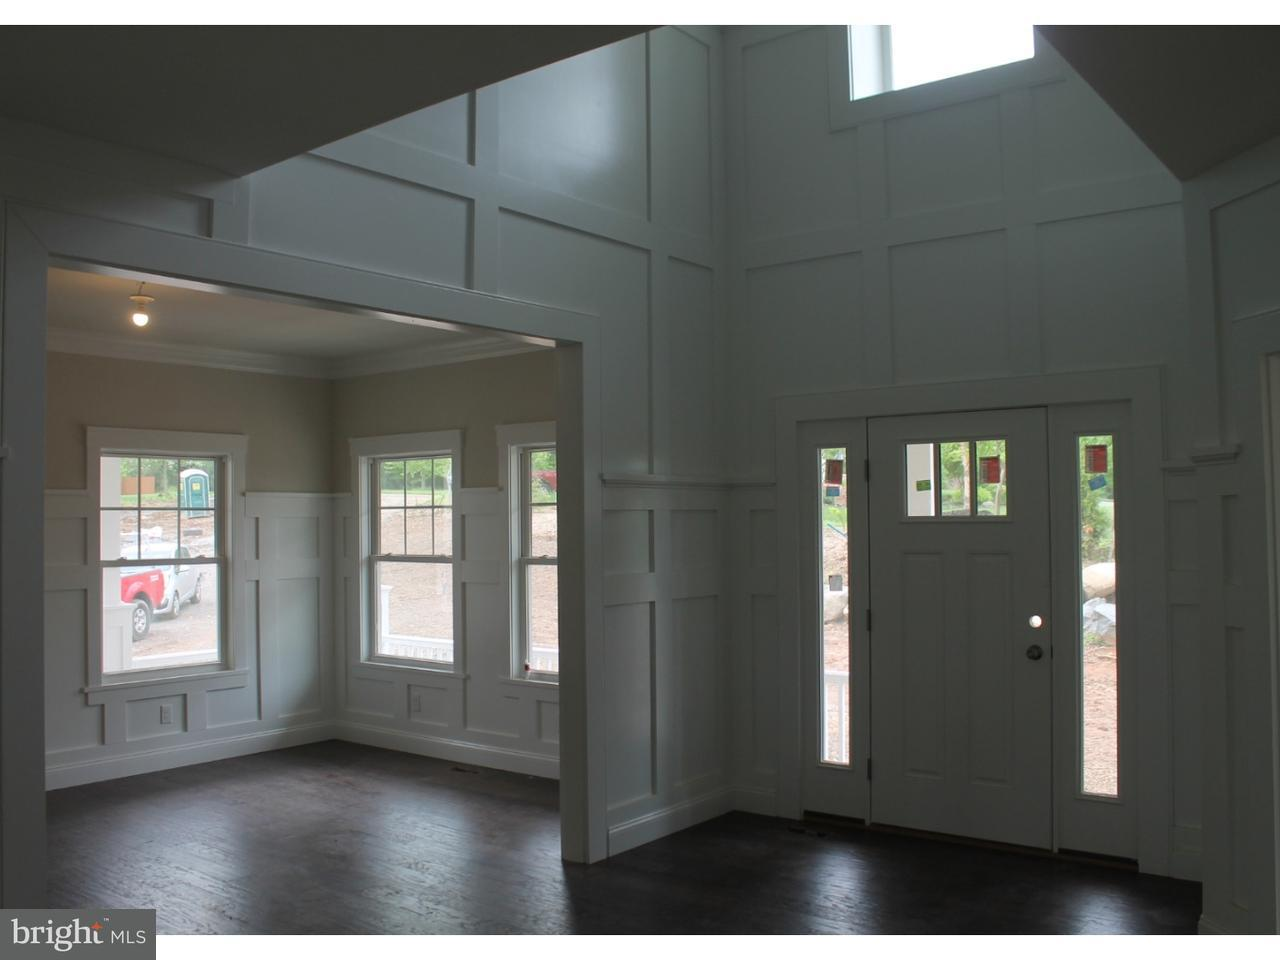 Single Family Home for Sale at 1531 GRAND OAK Lane Garnet Valley, Pennsylvania 19060 United States